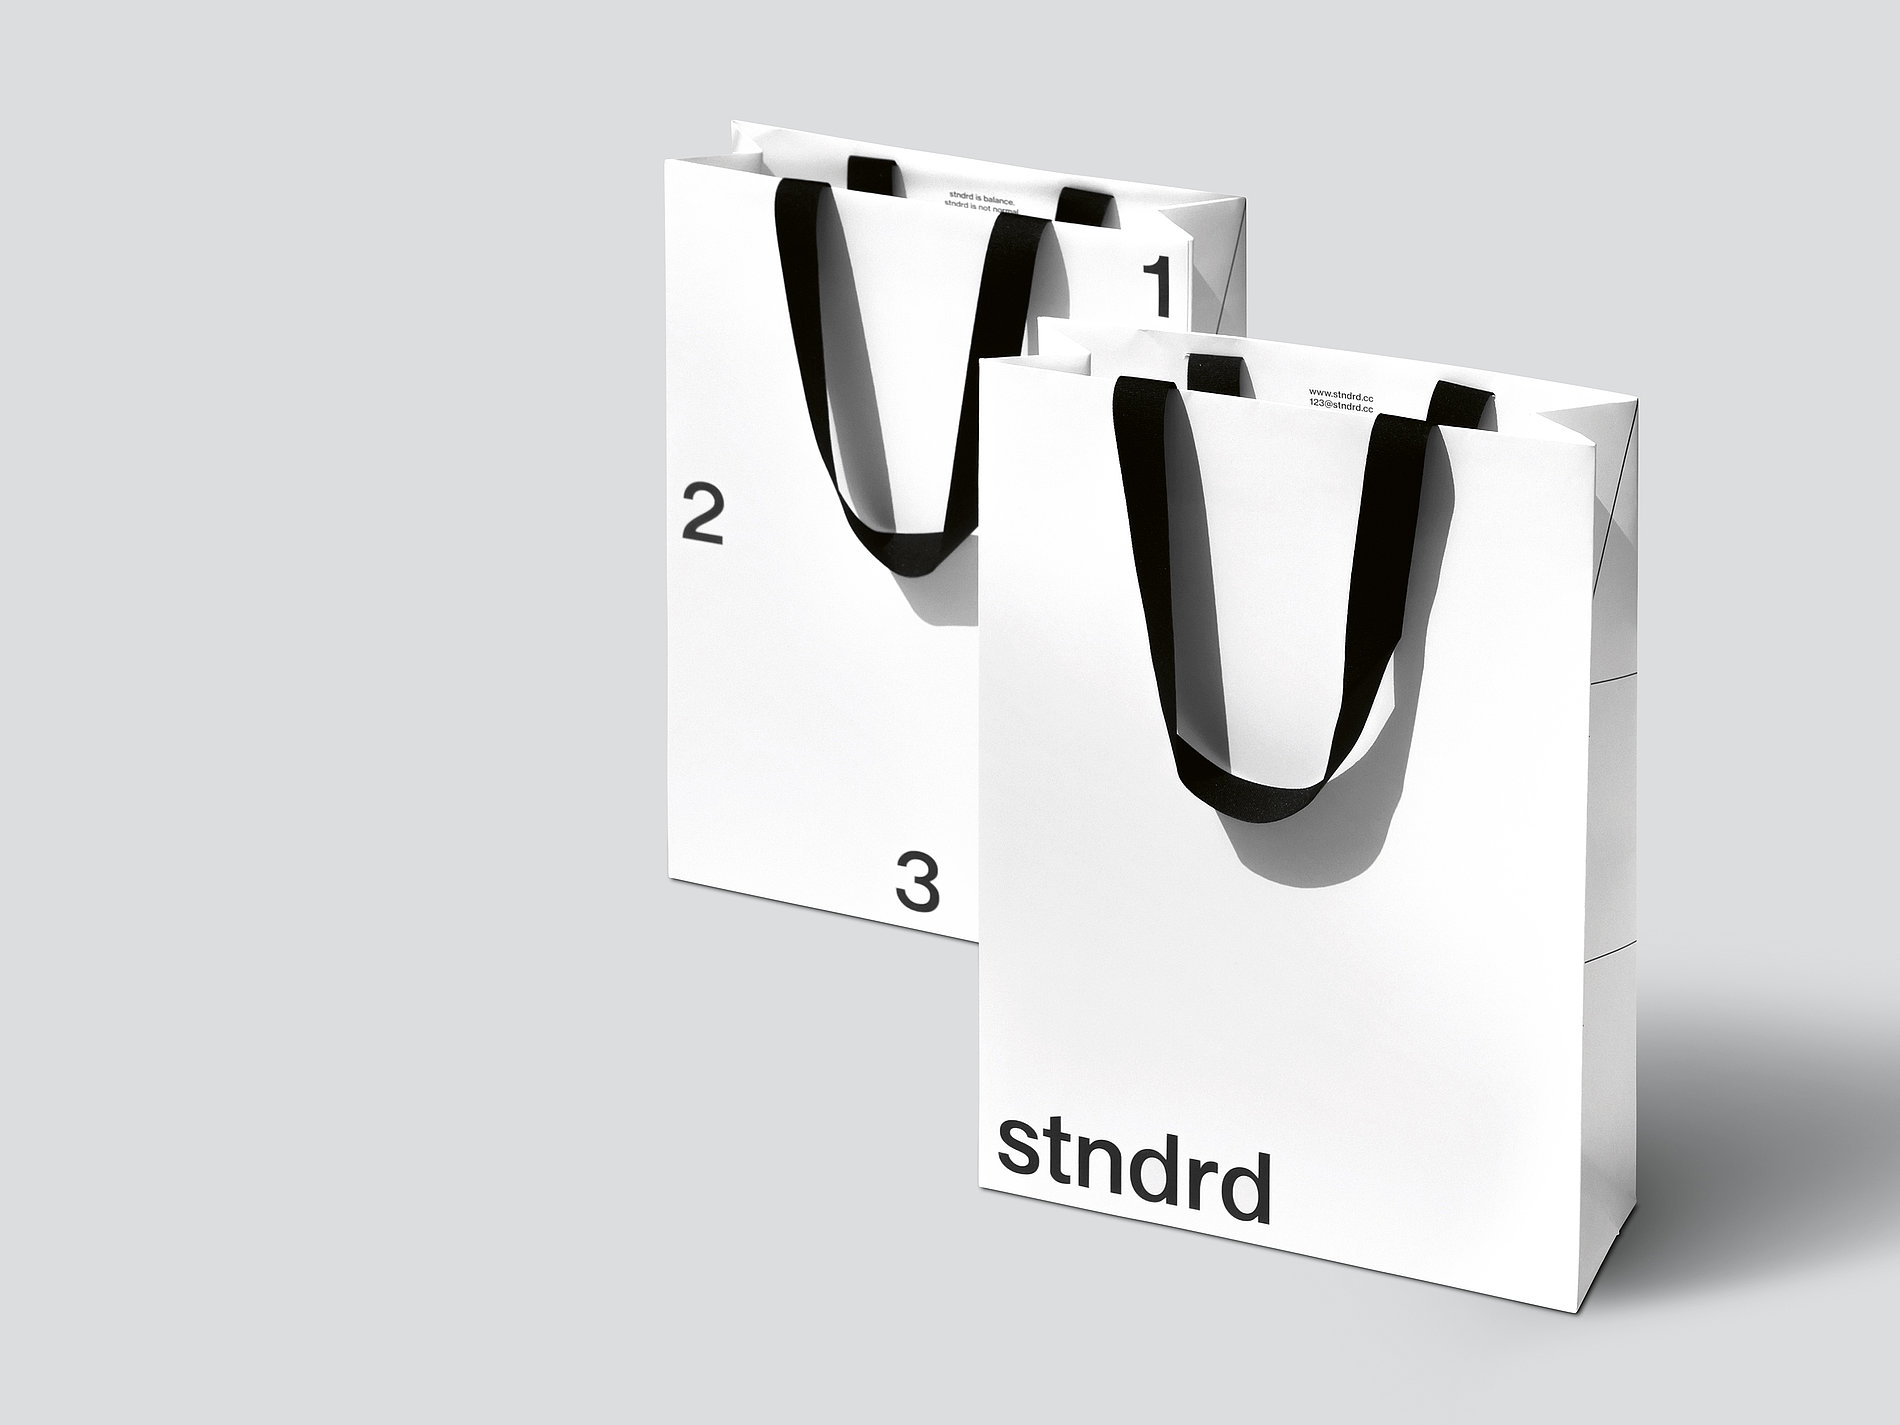 stndrd | Red Dot Design Award